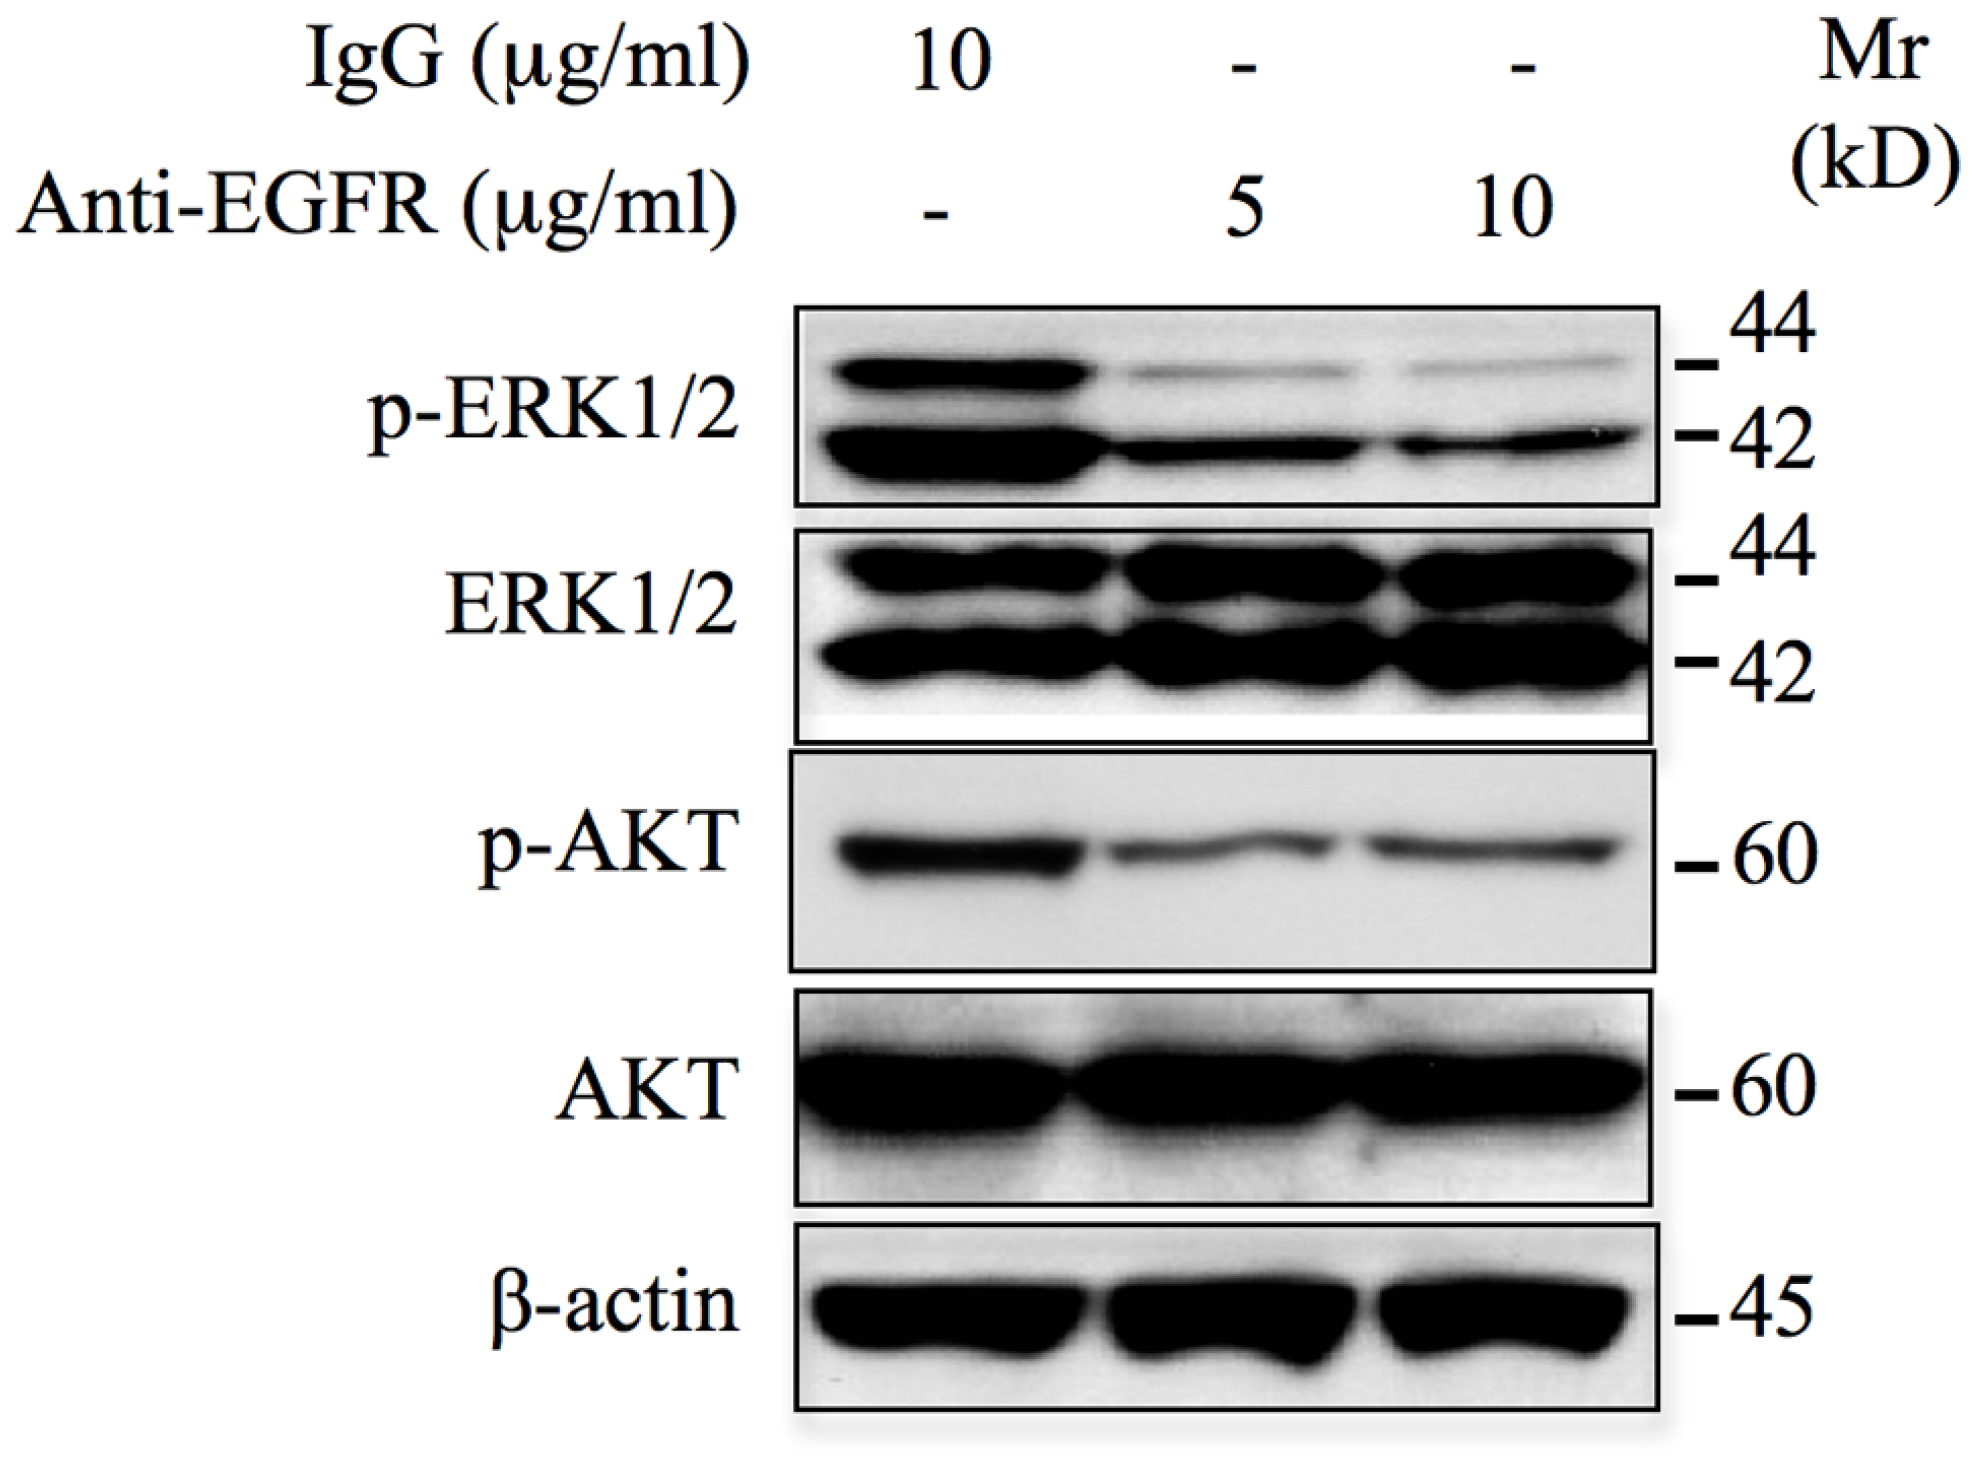 Monoclonal anti-EGFR neutralizing antibodies inhibit ERK1/2 and AKT signaling pathways.